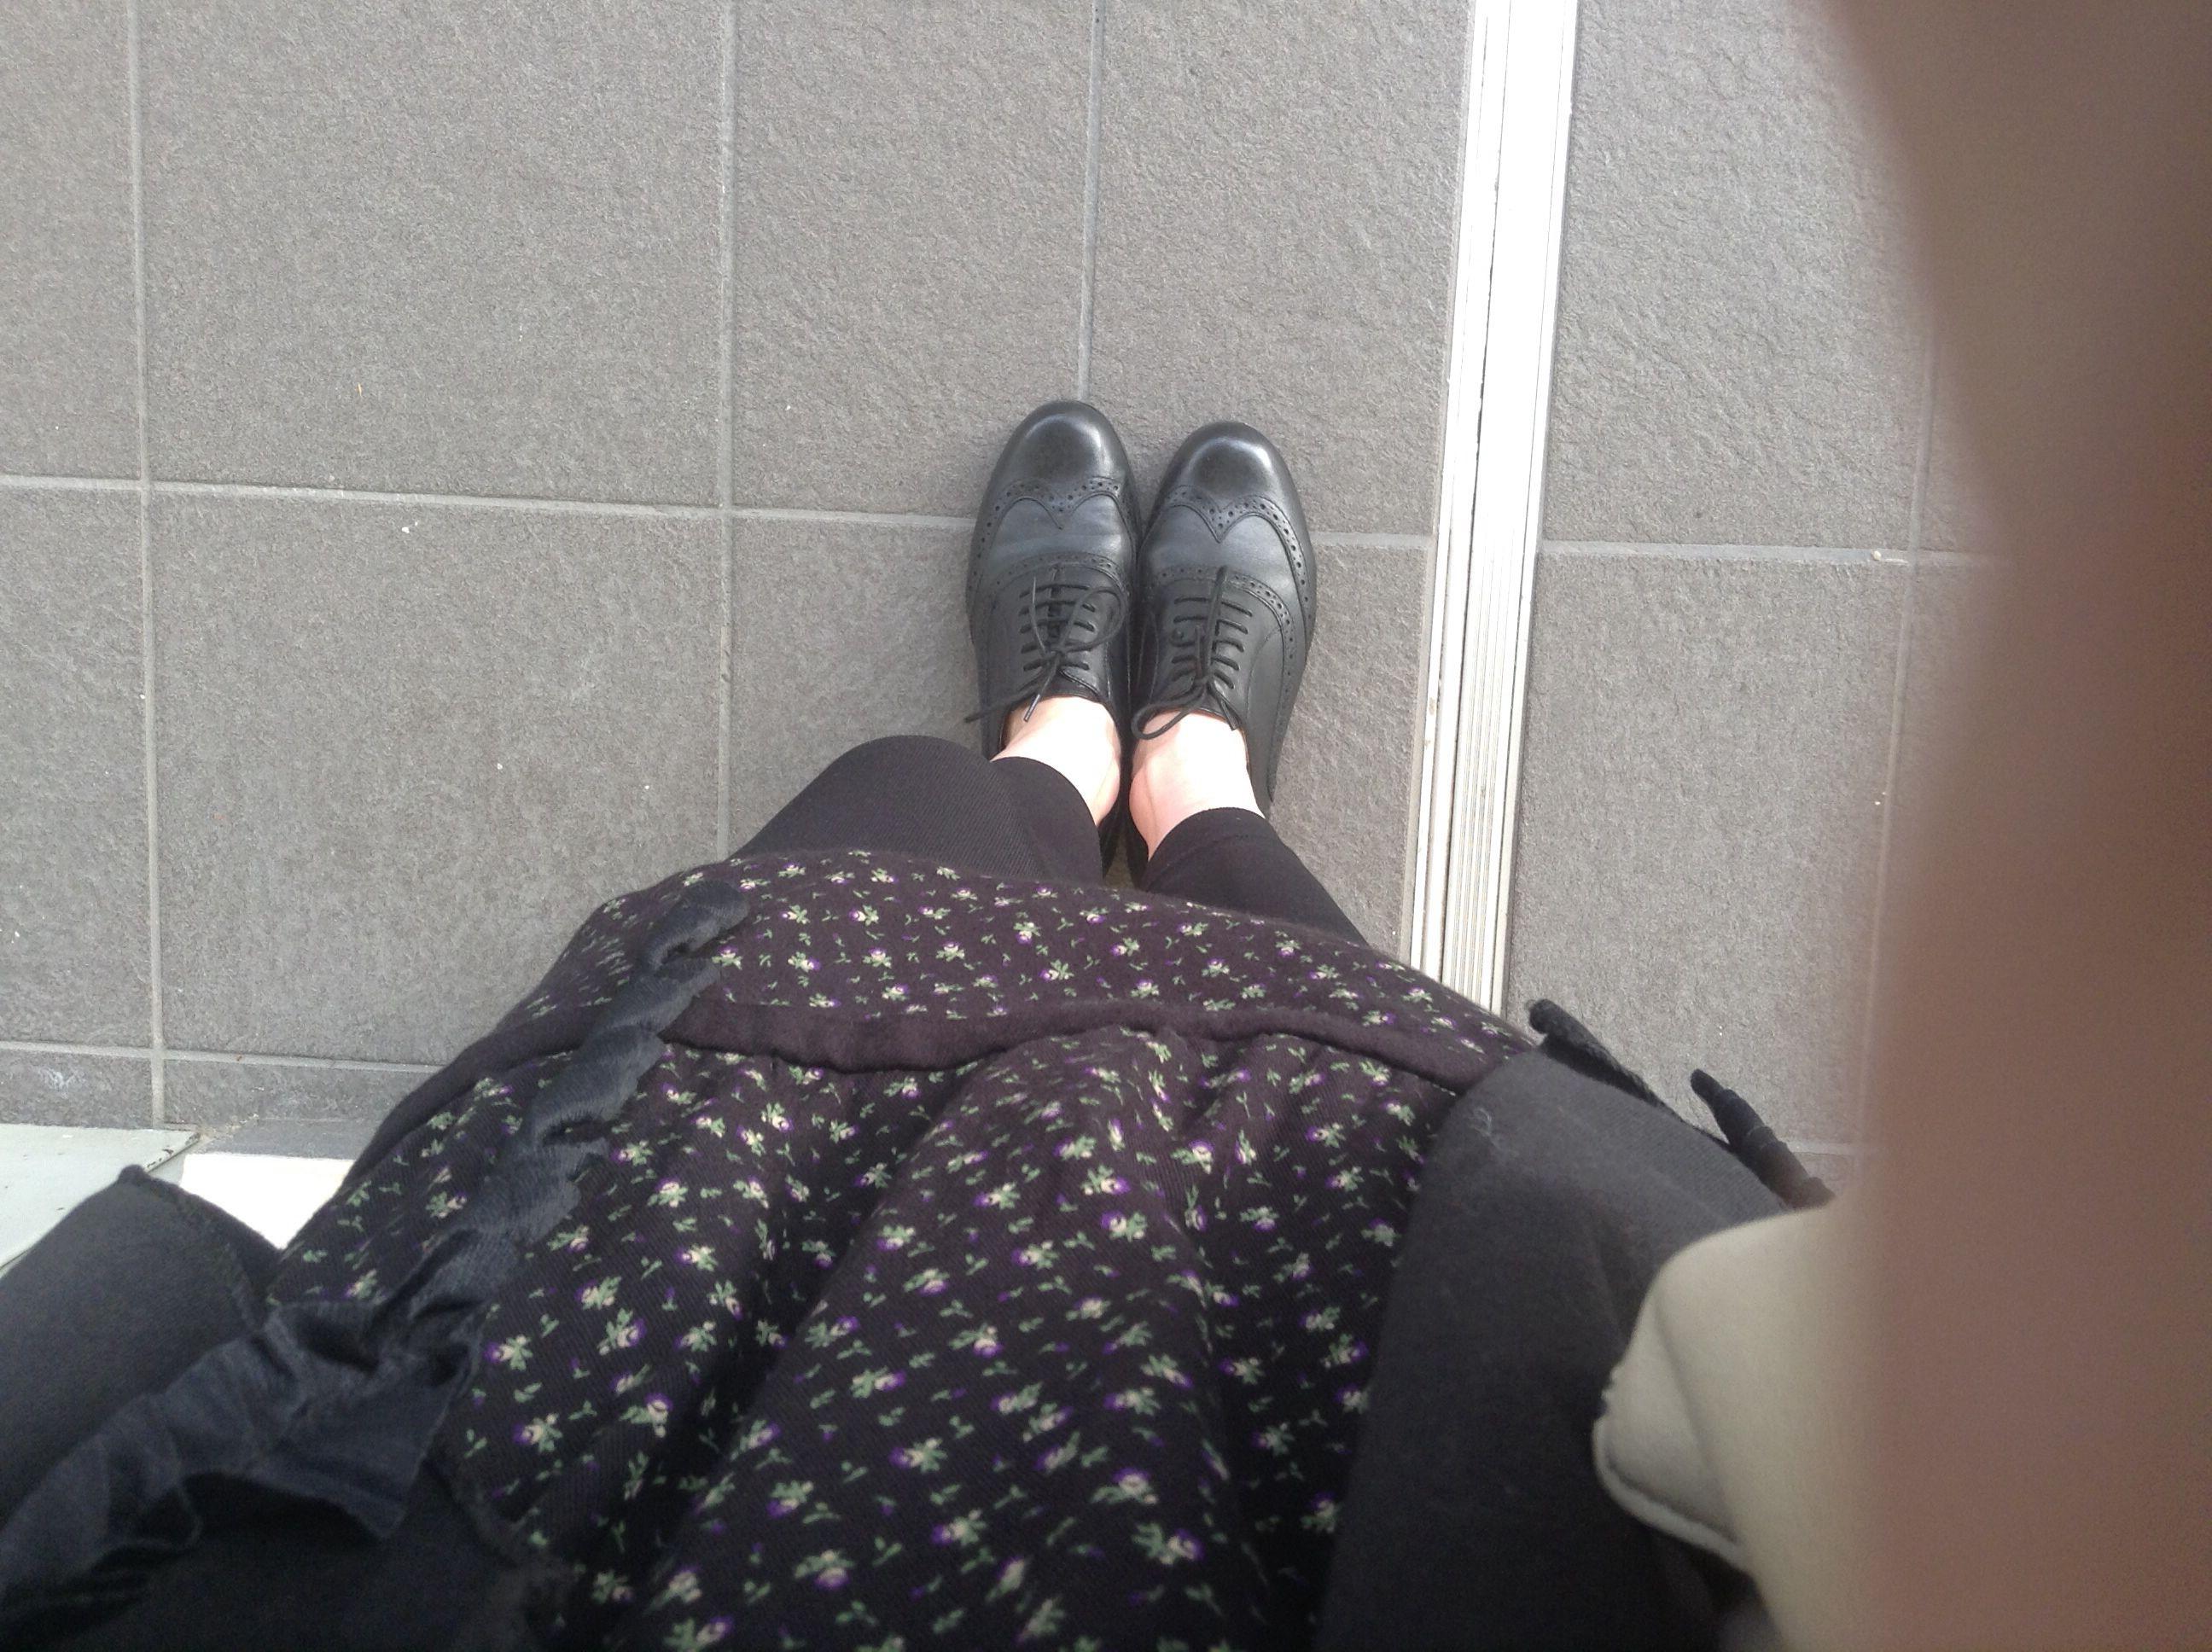 Preppy shoes in spring